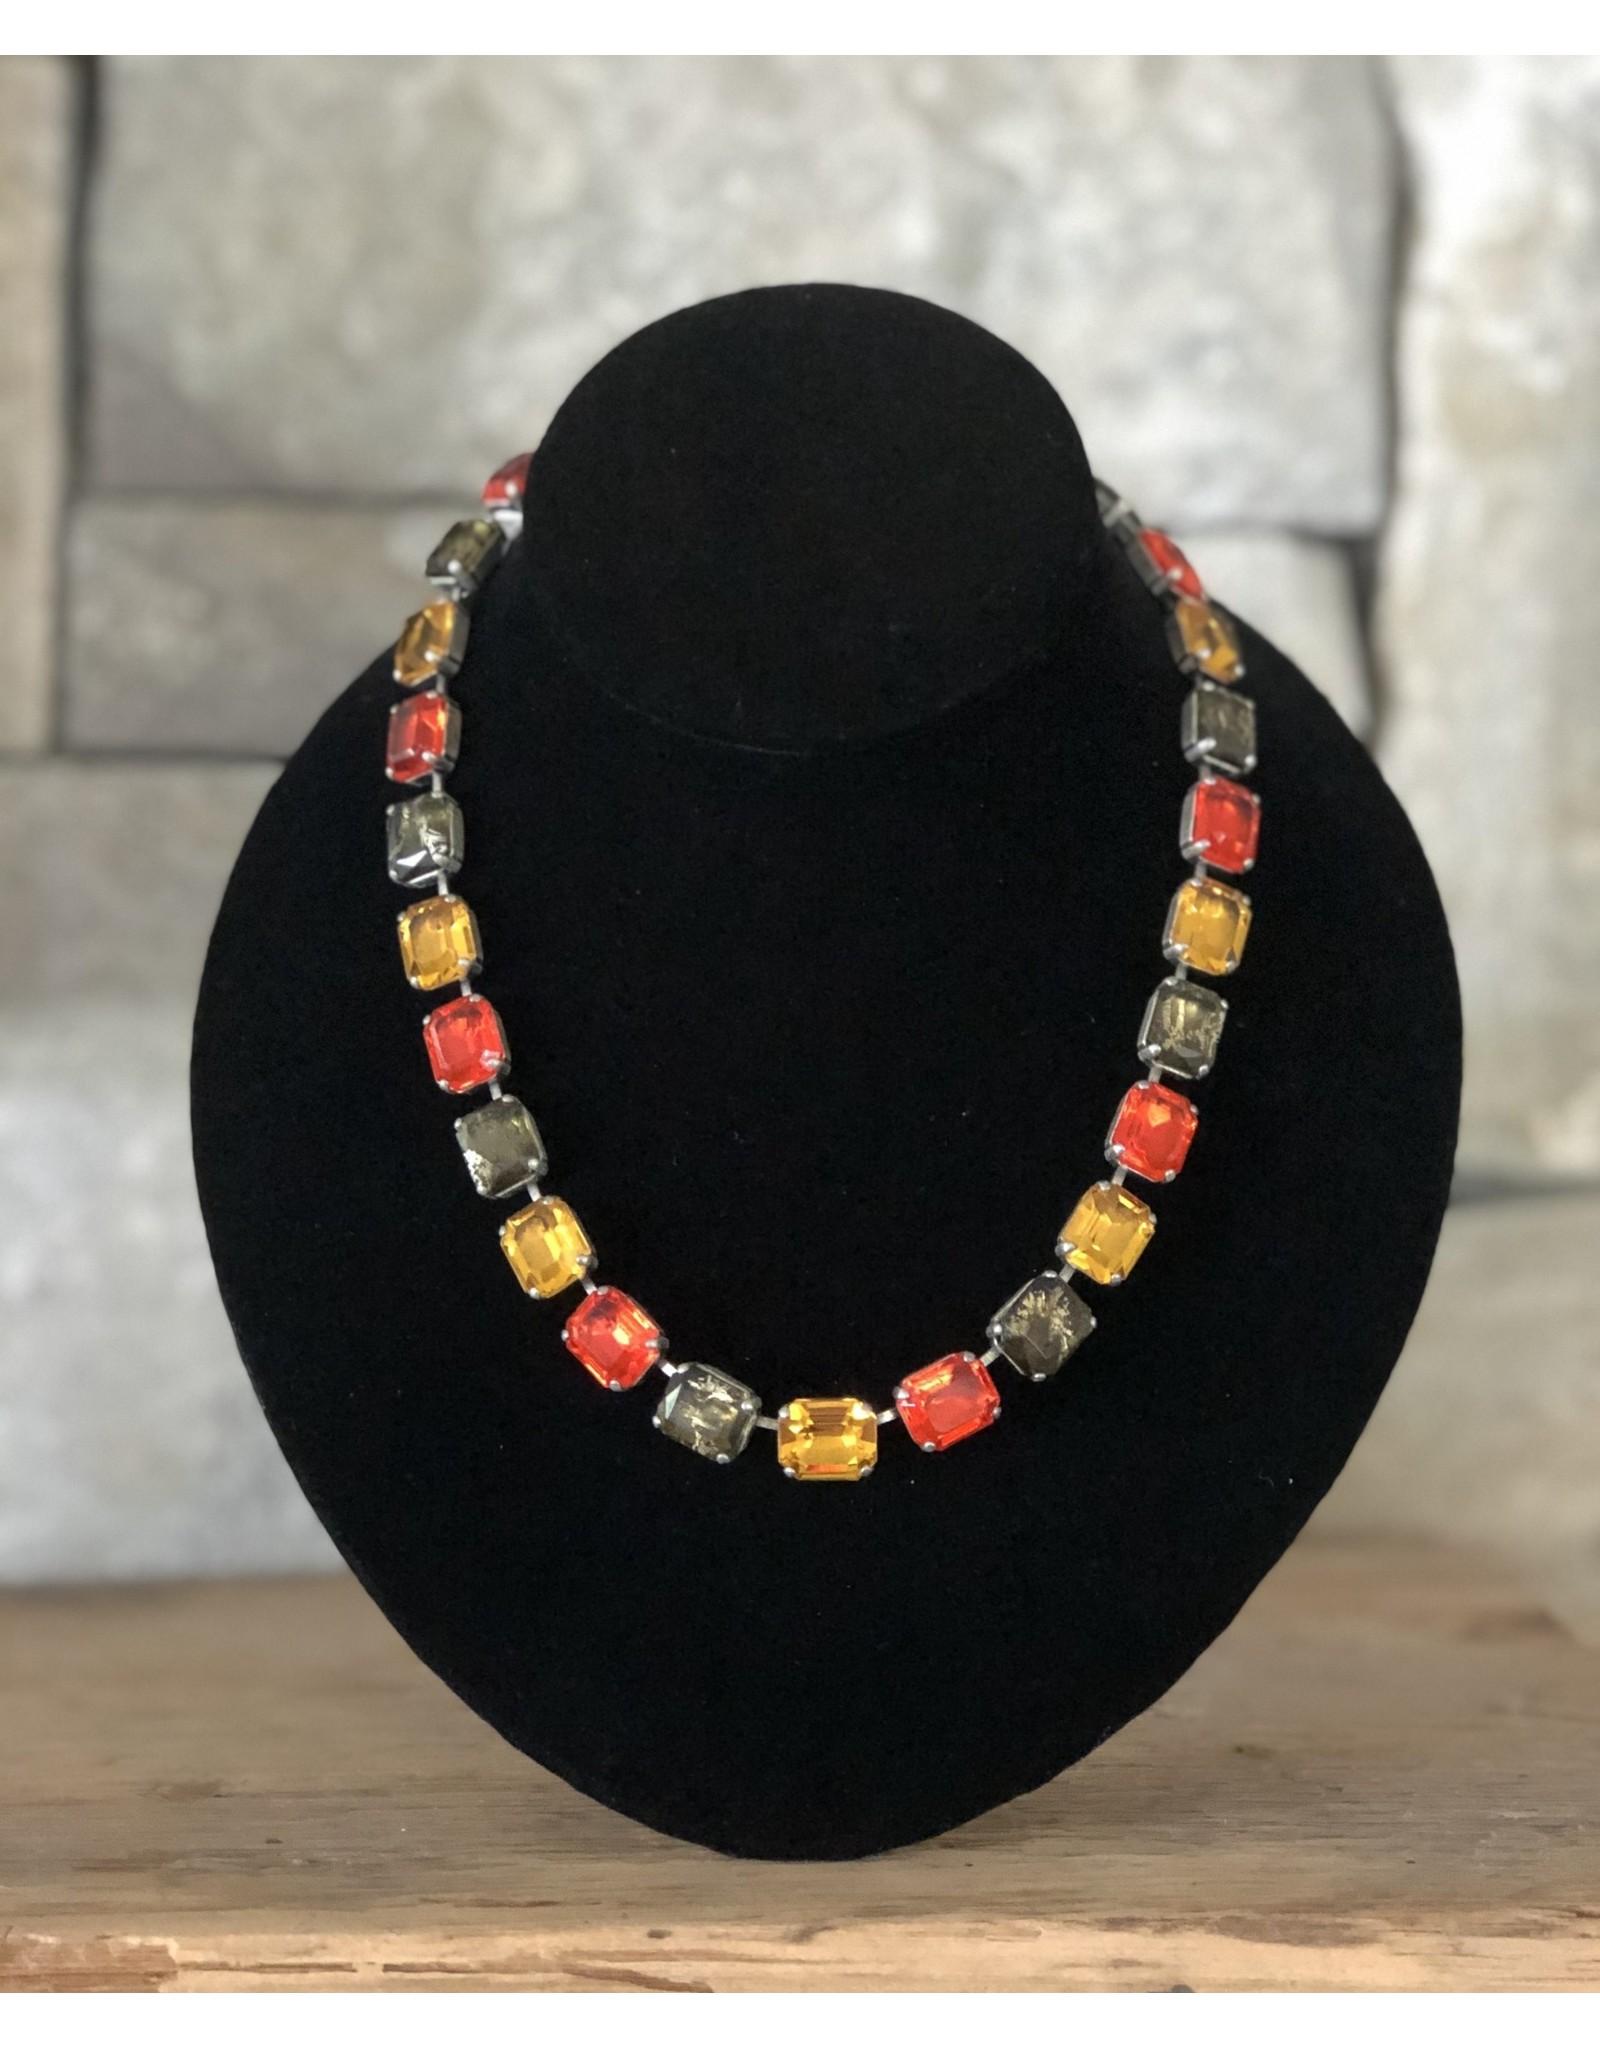 Jean Louis Blinn Antique Silver w/ Topaz and Orange Necklace